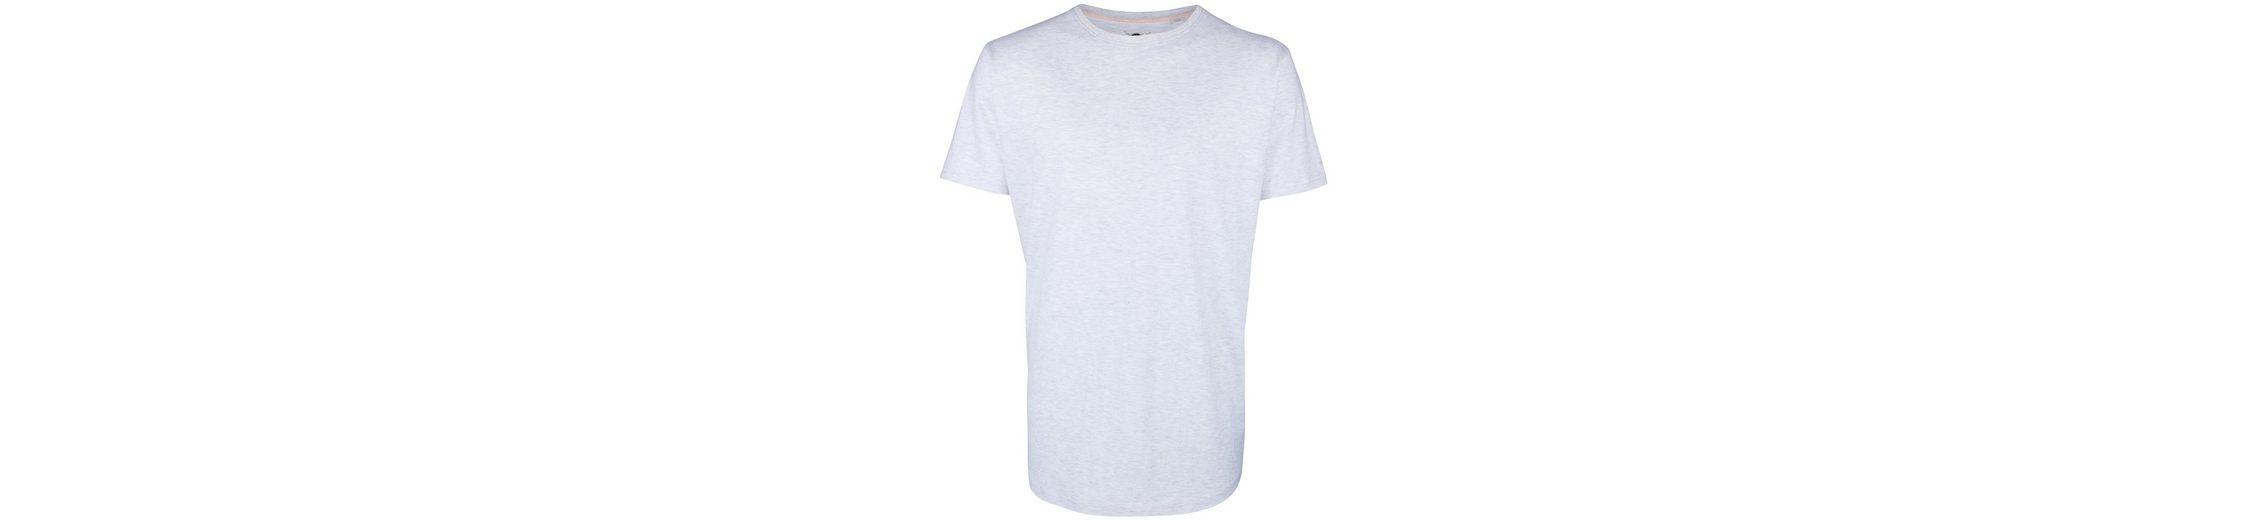 TUFFSKULL T-Shirt